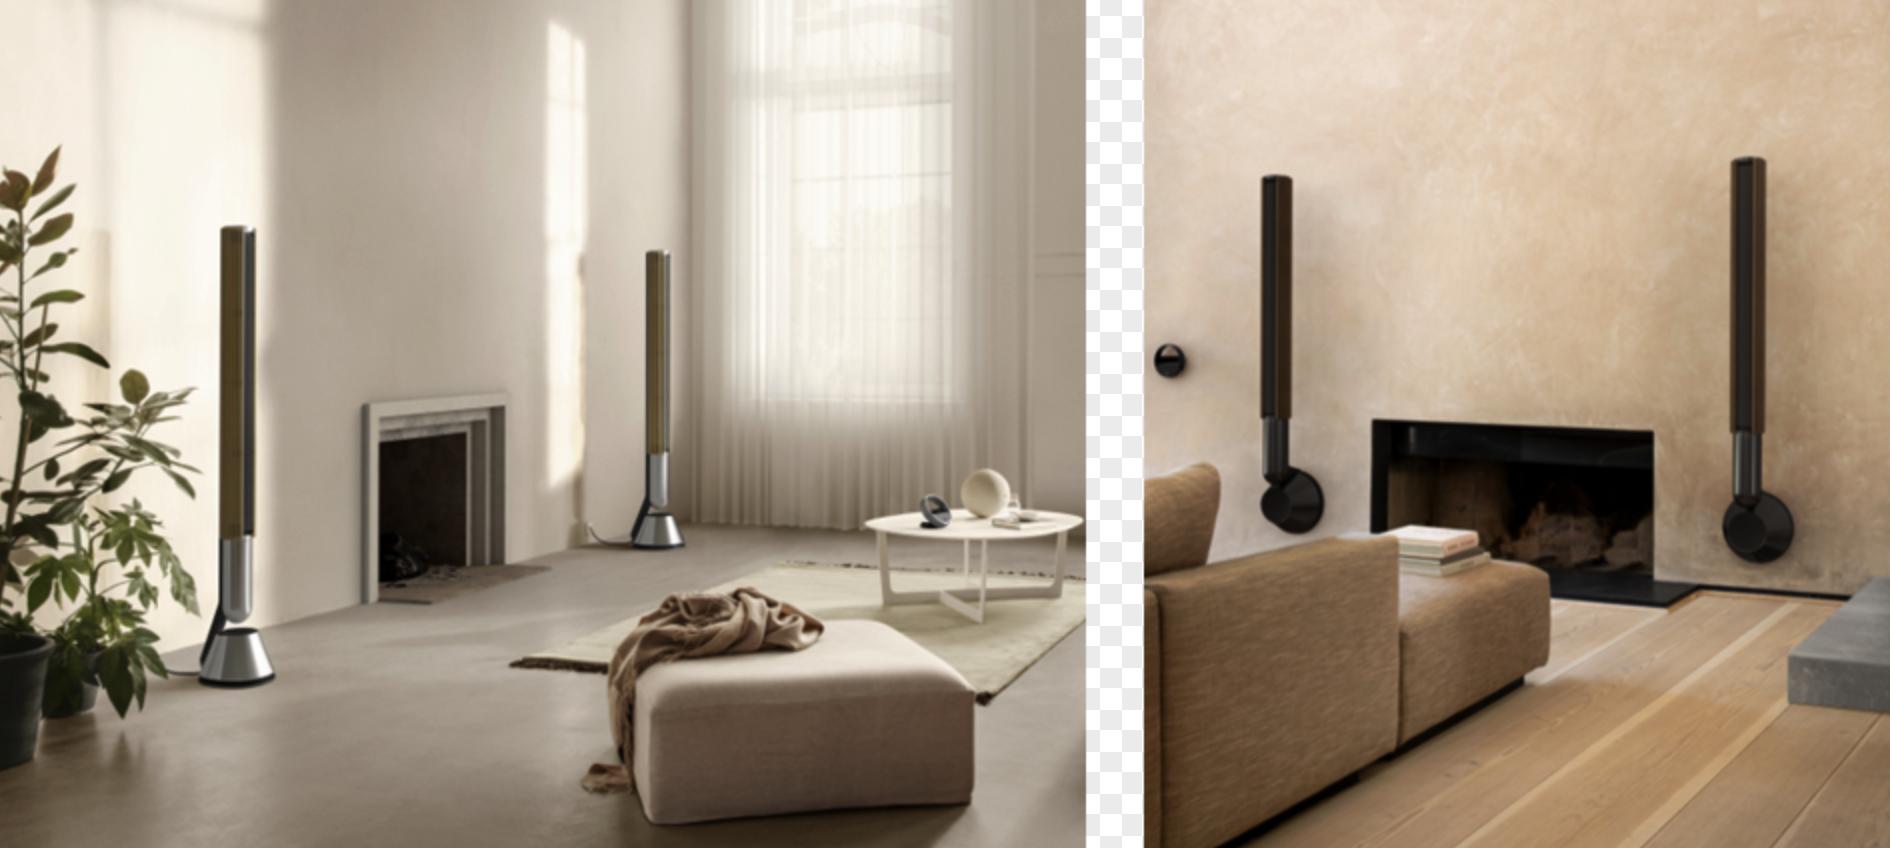 beolab 28 wireless speaker